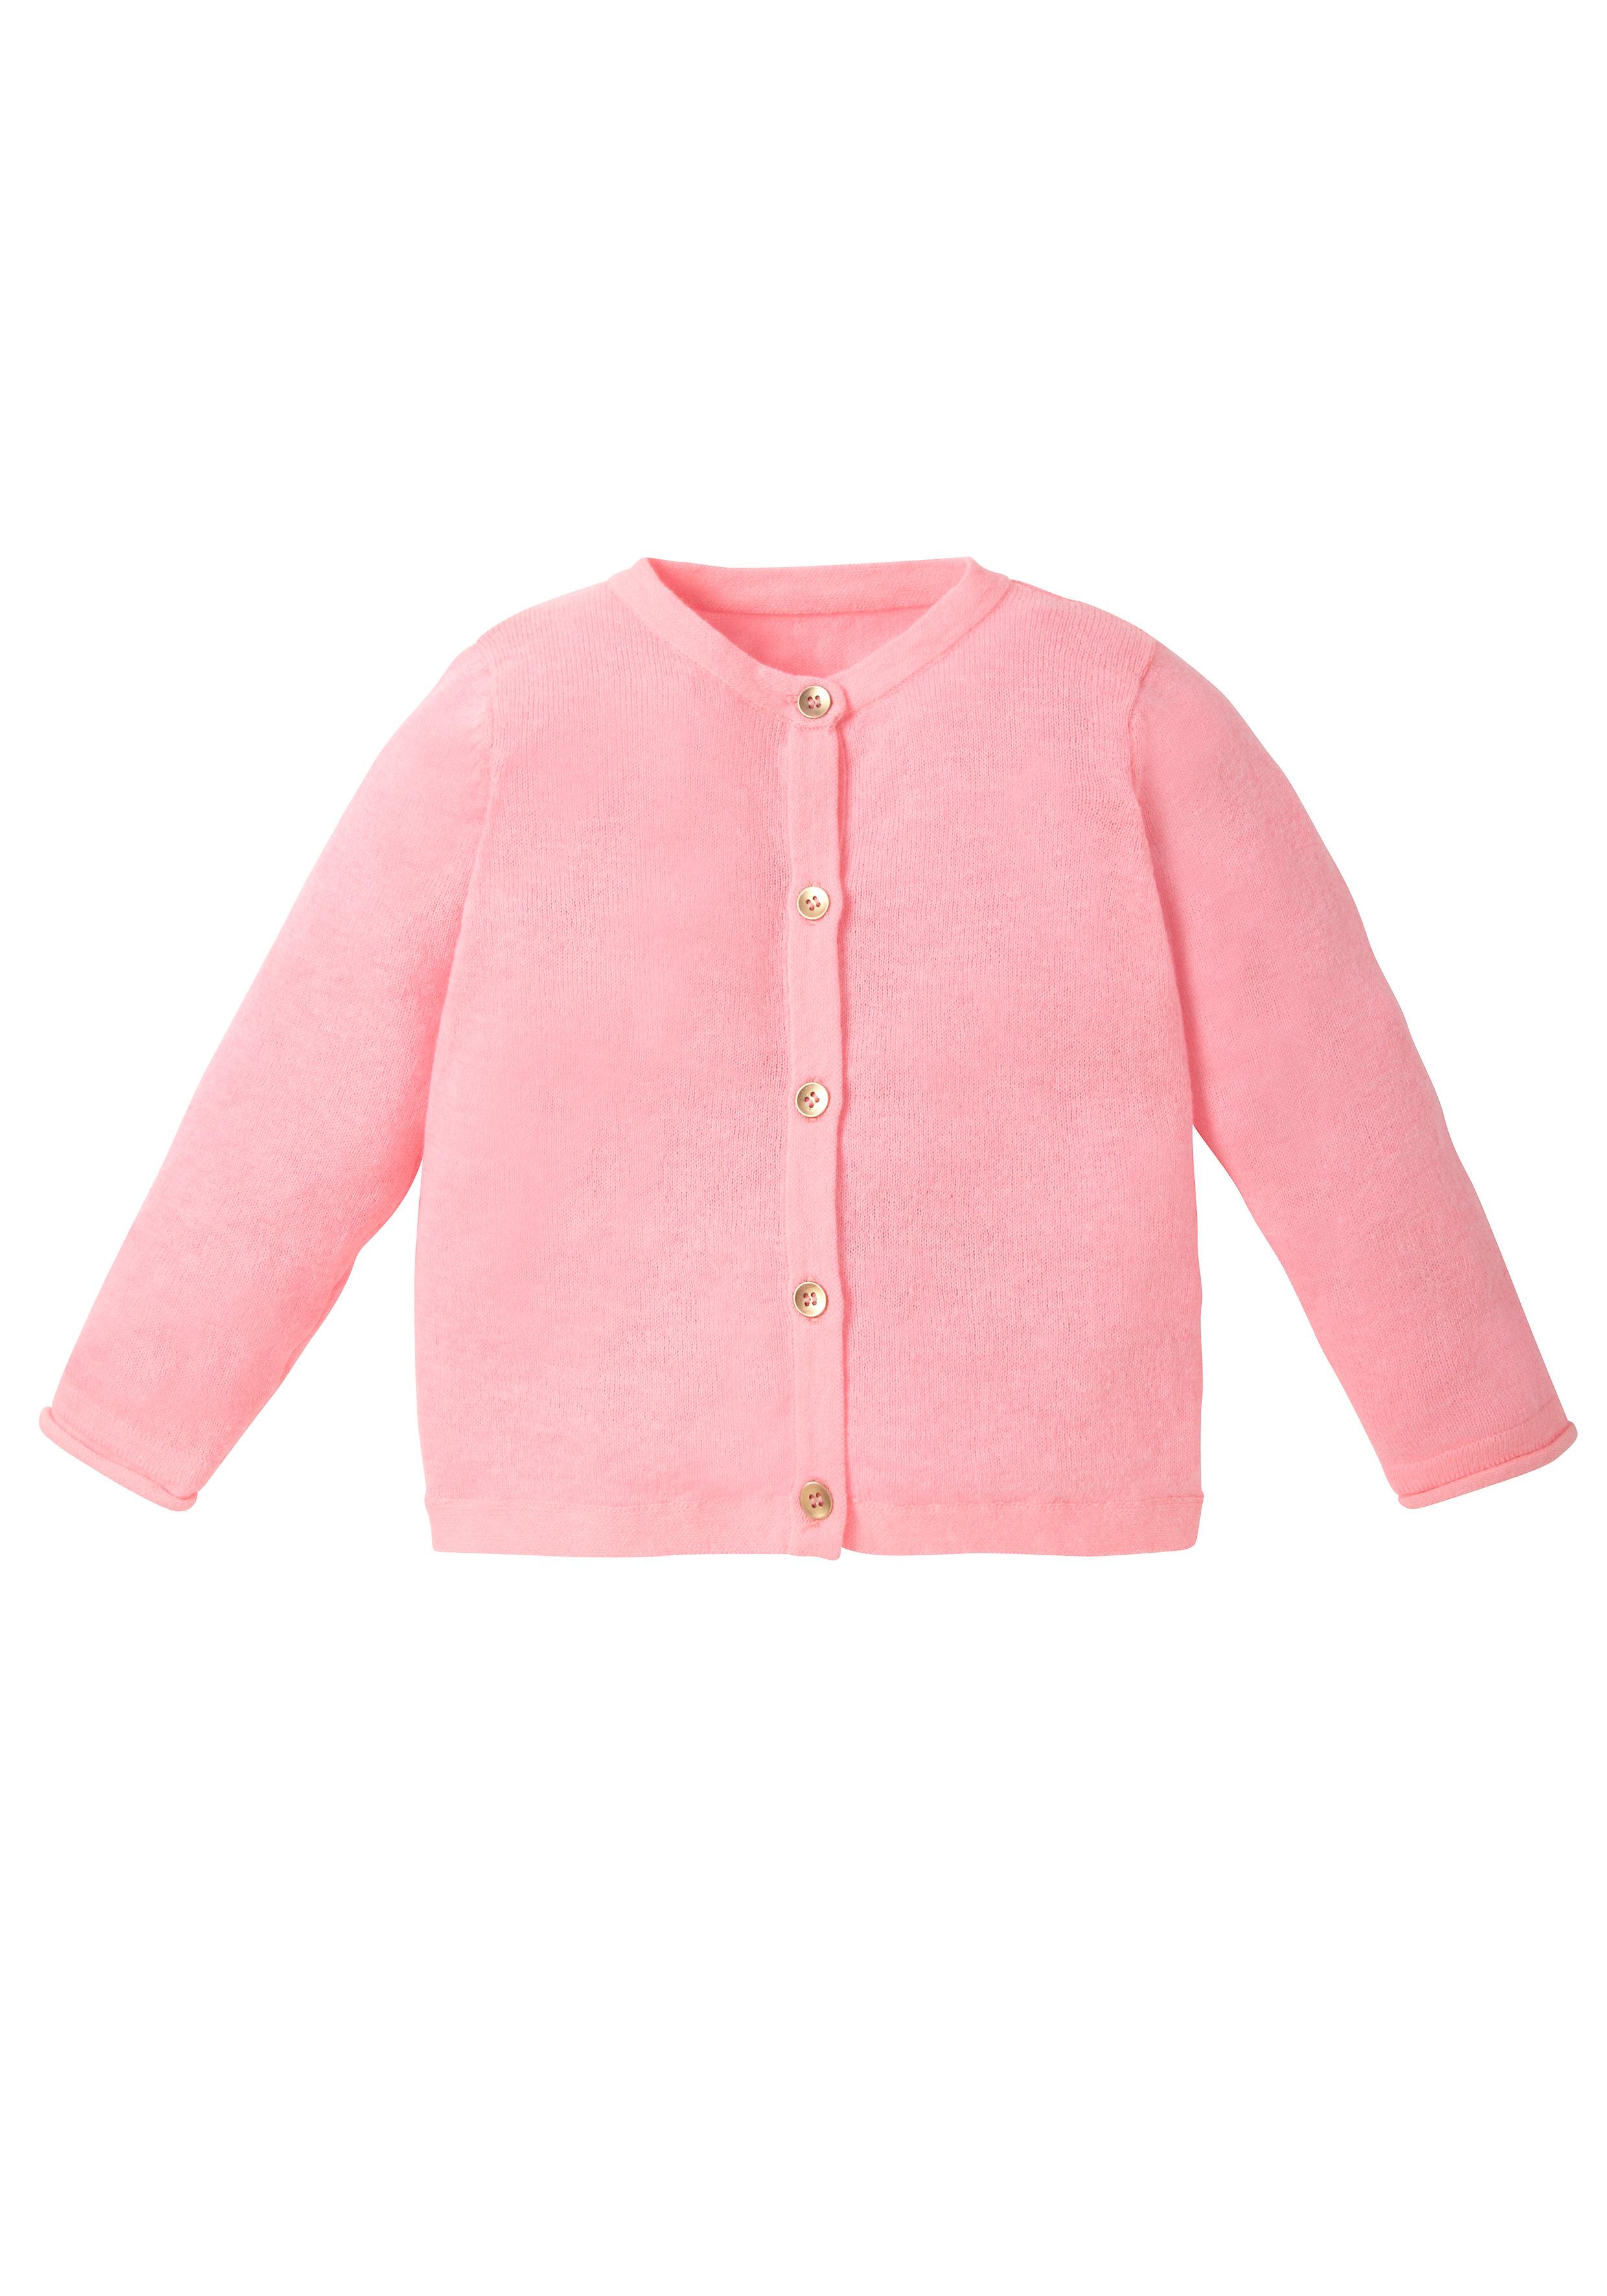 Mothercare   Girls Full Sleeves Cardigan - Pink